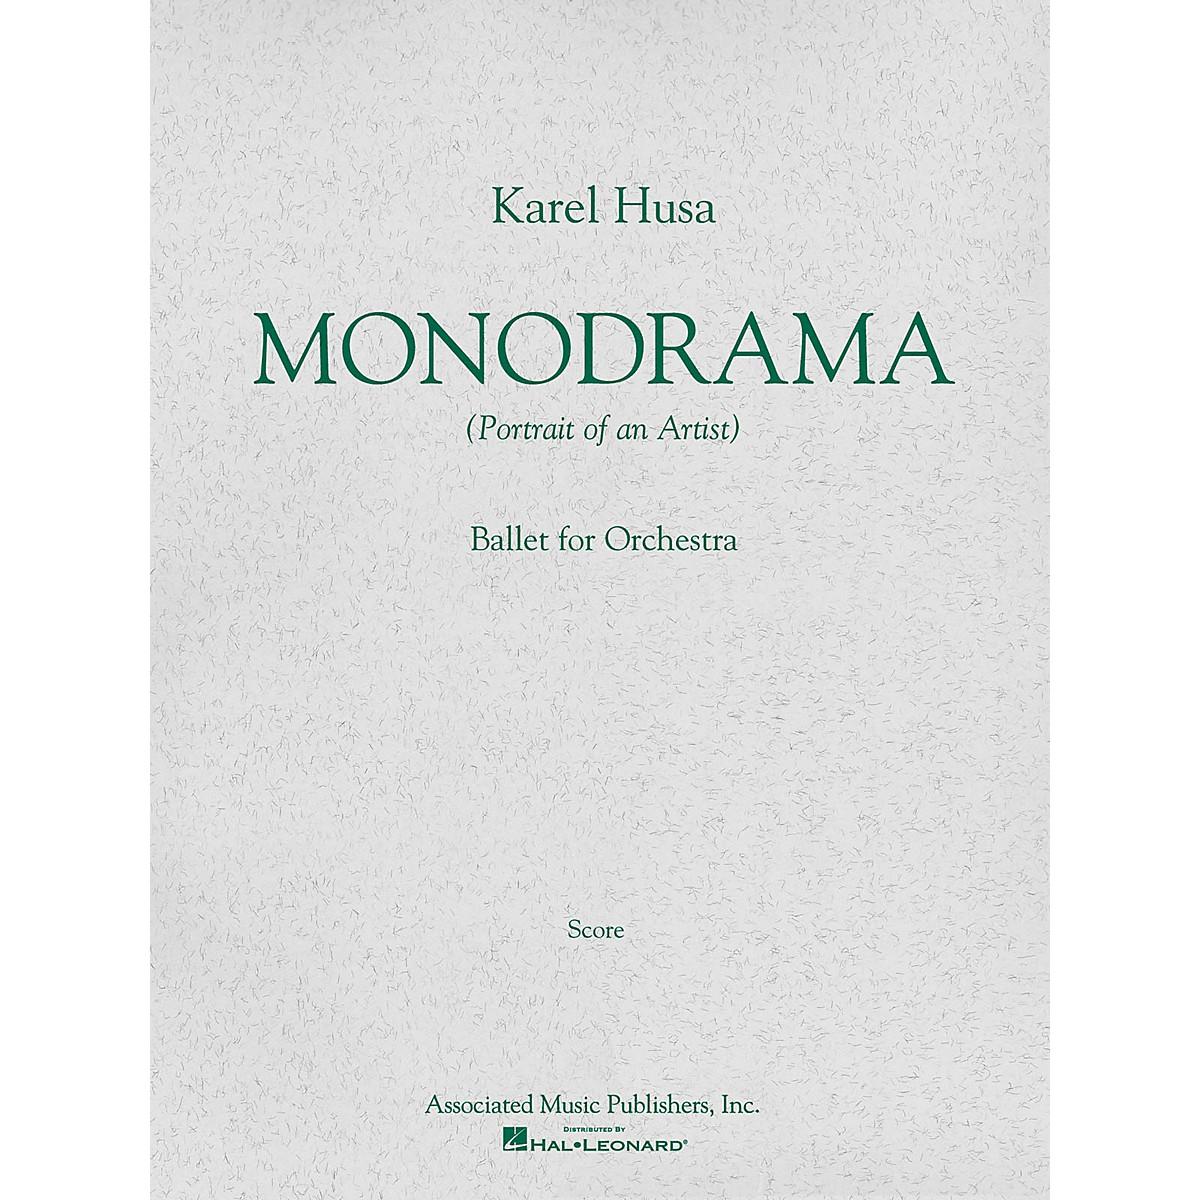 Associated Monodrama (Portrait of an Artist) (Miniature Full Score) Study Score Series Composed by Karel Husa